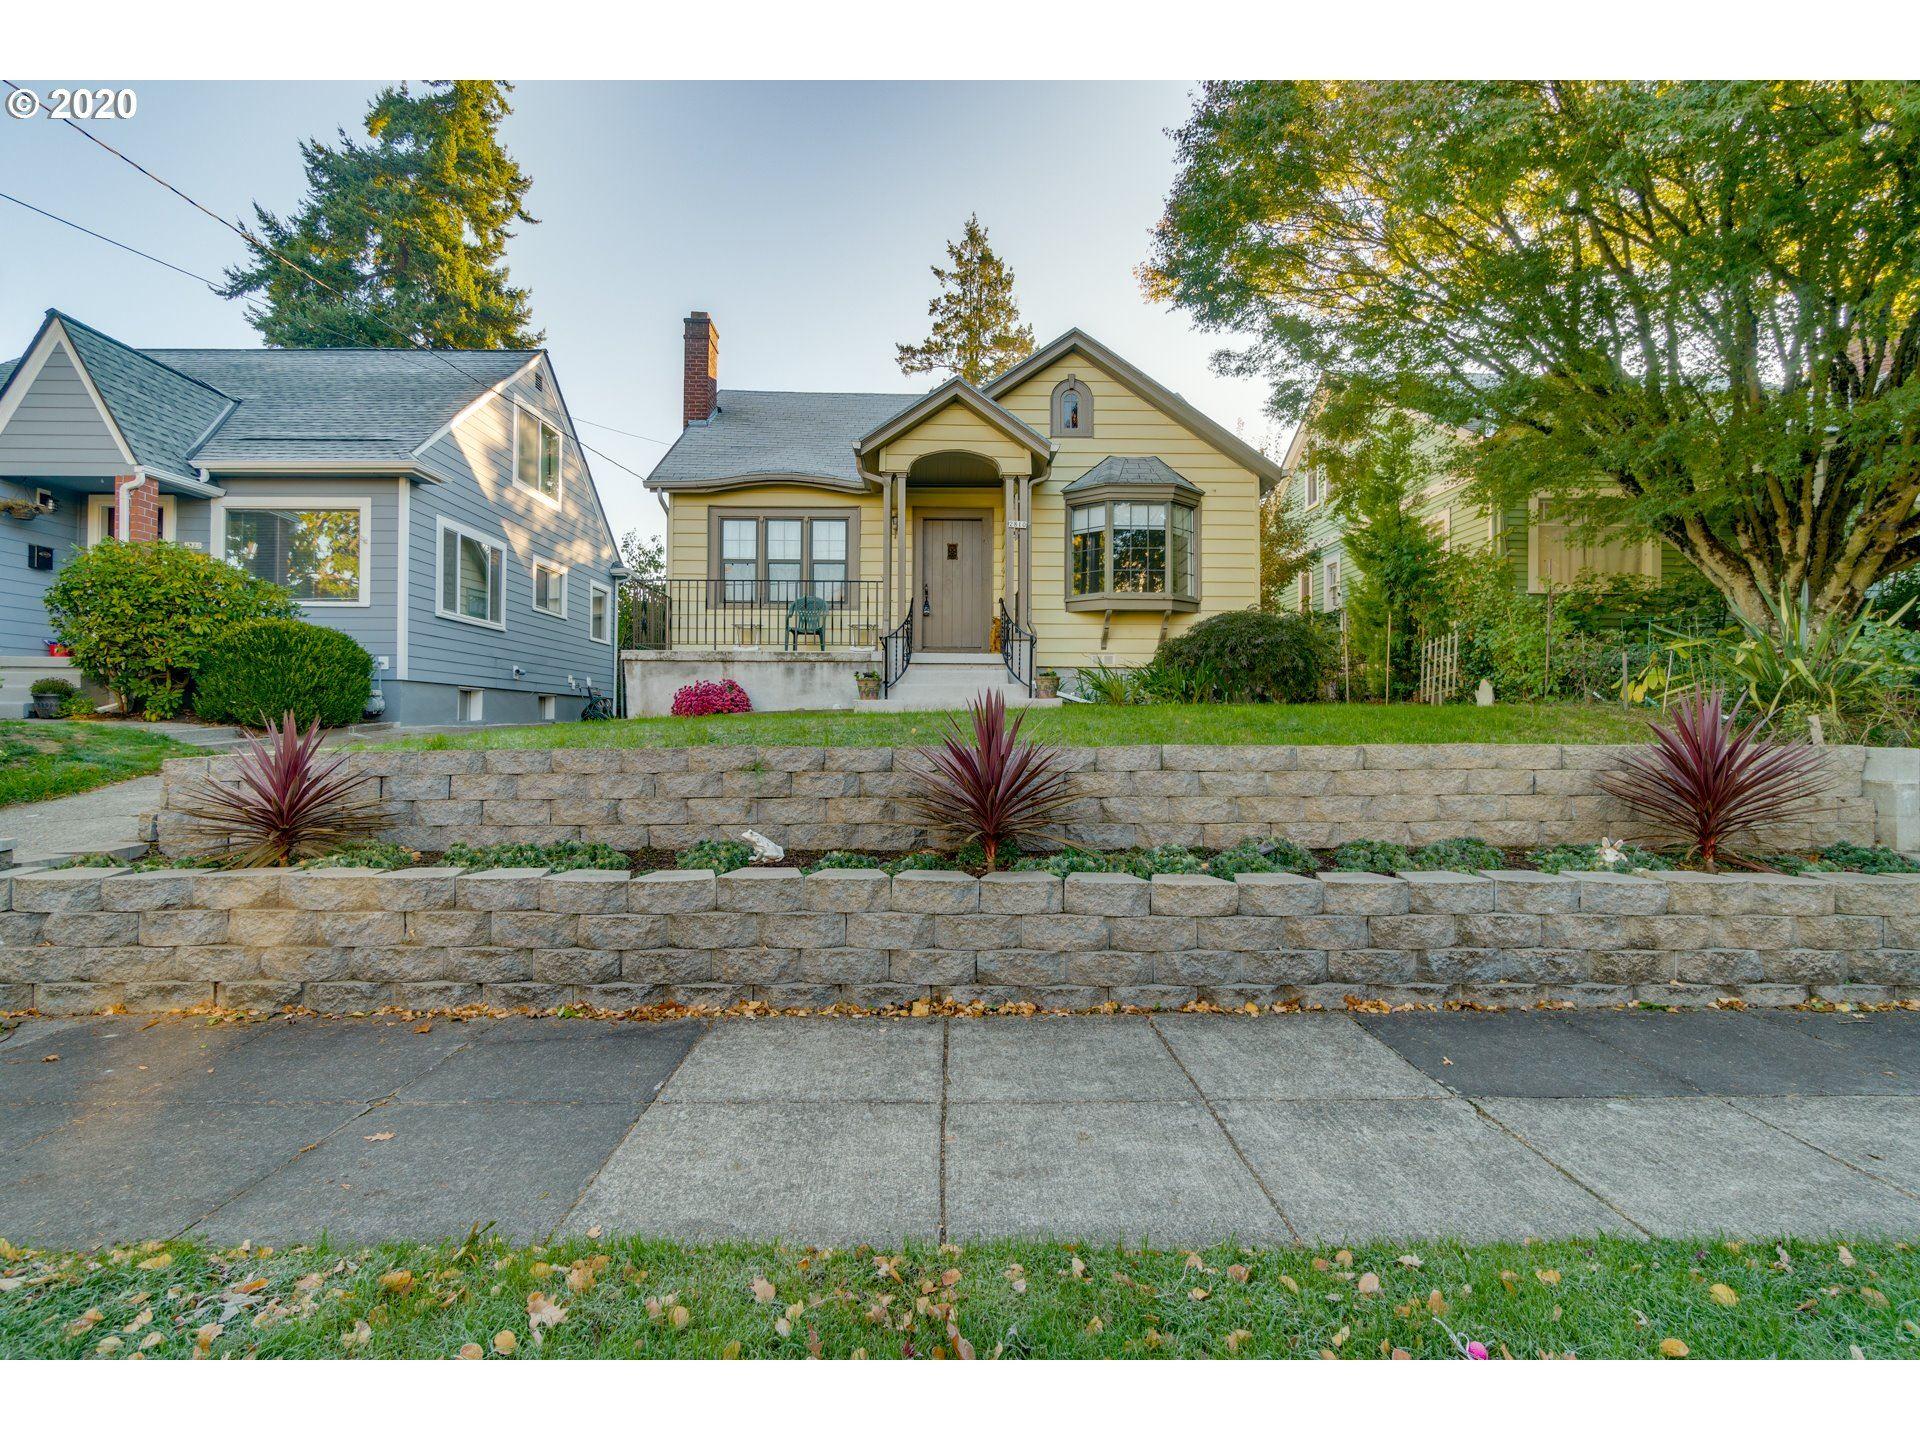 2810 NE 35TH AVE, Portland, OR 97212 - MLS#: 20542405